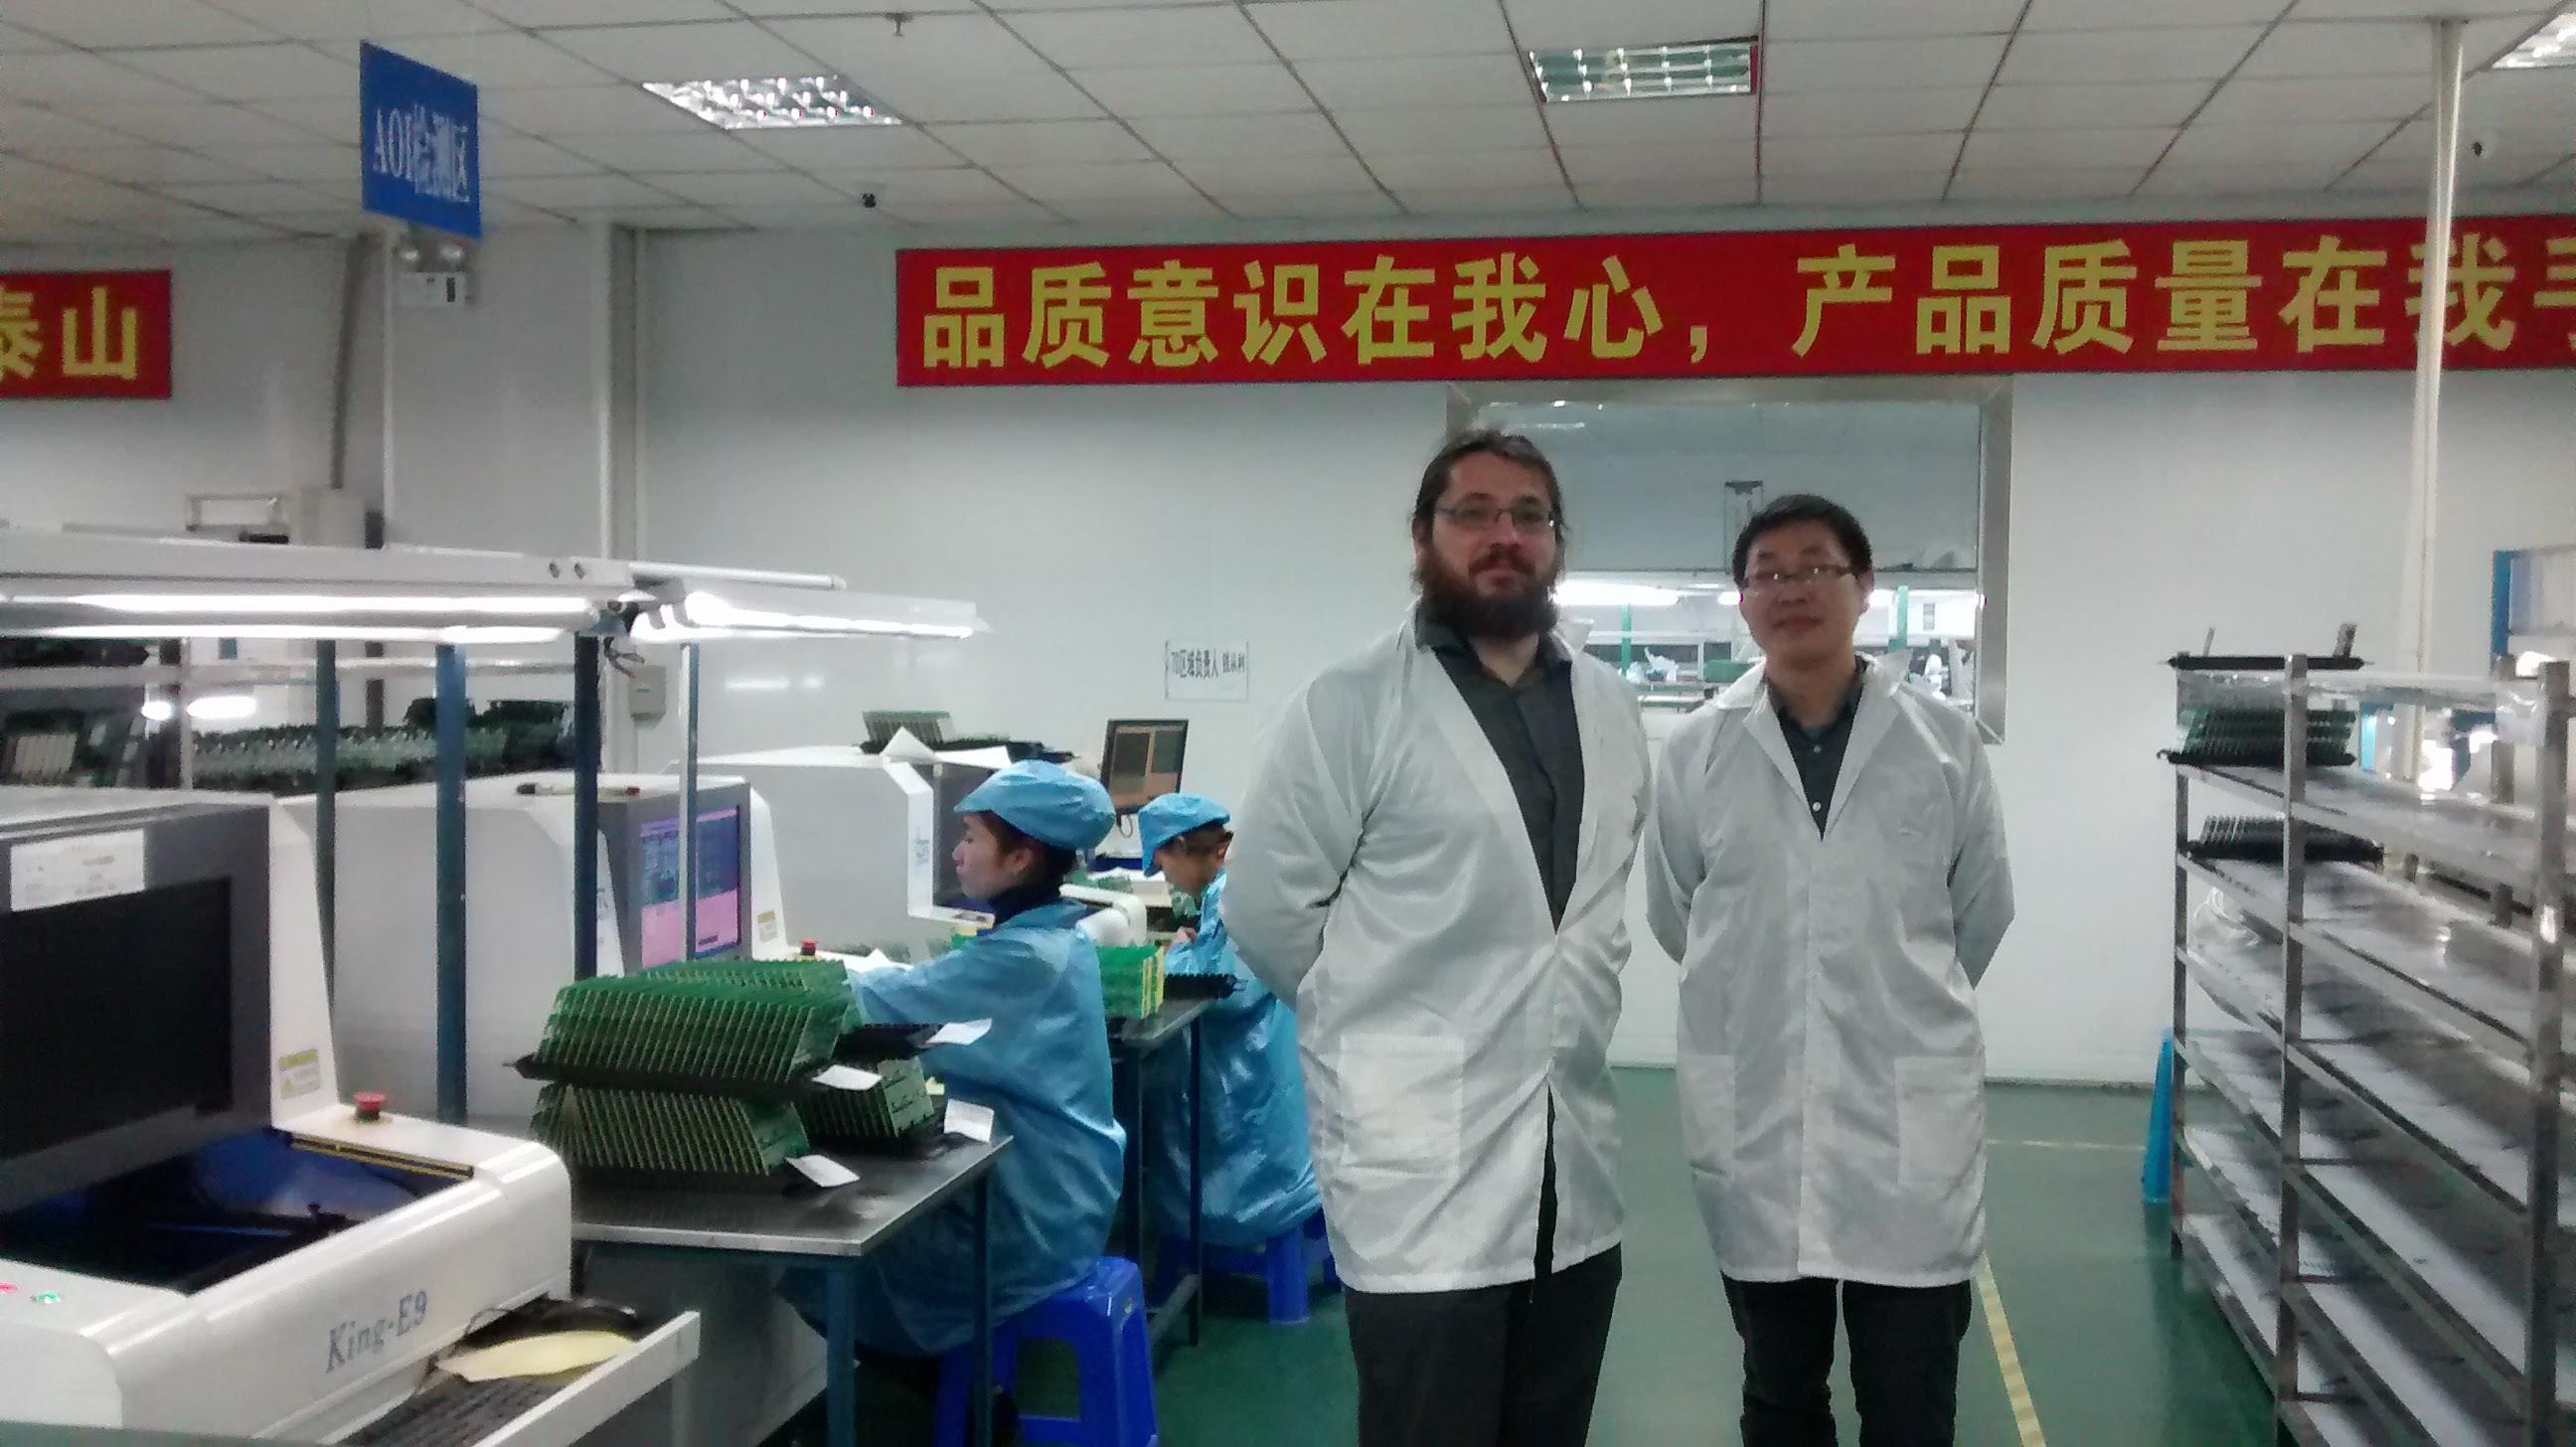 mart-me besucht Produktion in China